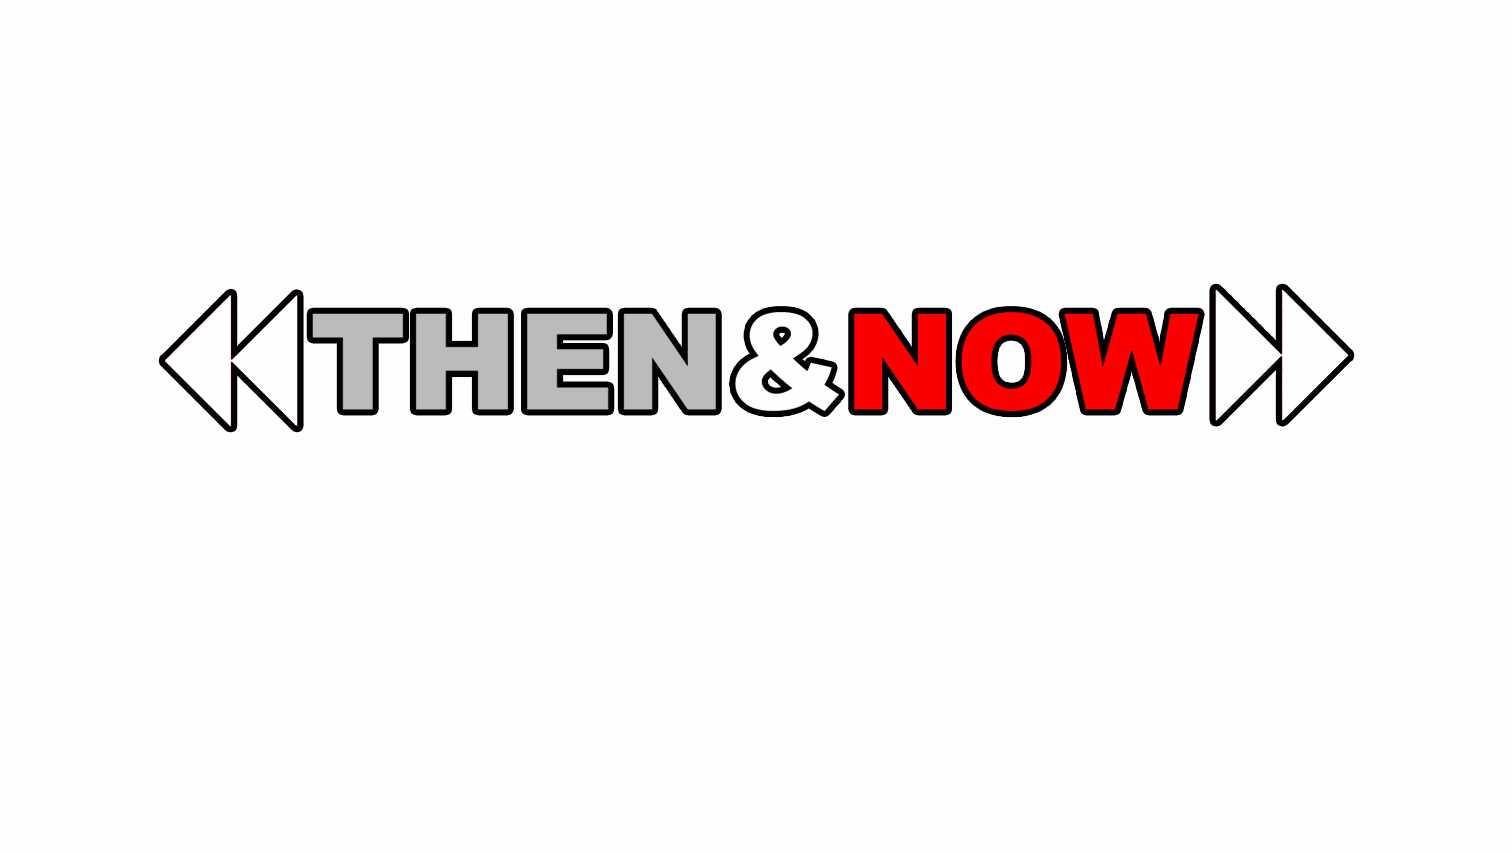 then & now_1536291698206.jpg.jpg